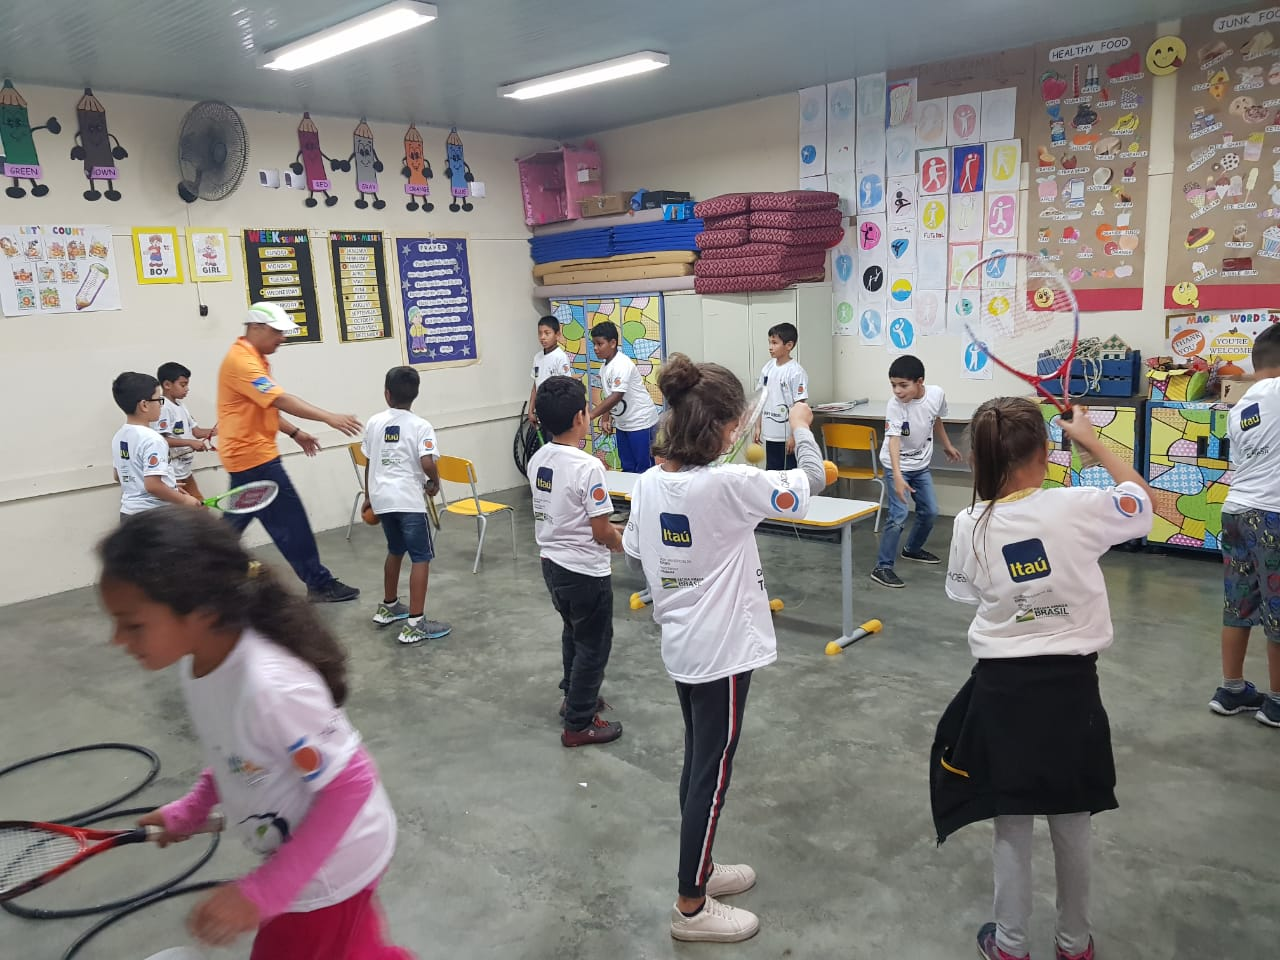 Tênis na sala de aula - Apiaí/SP